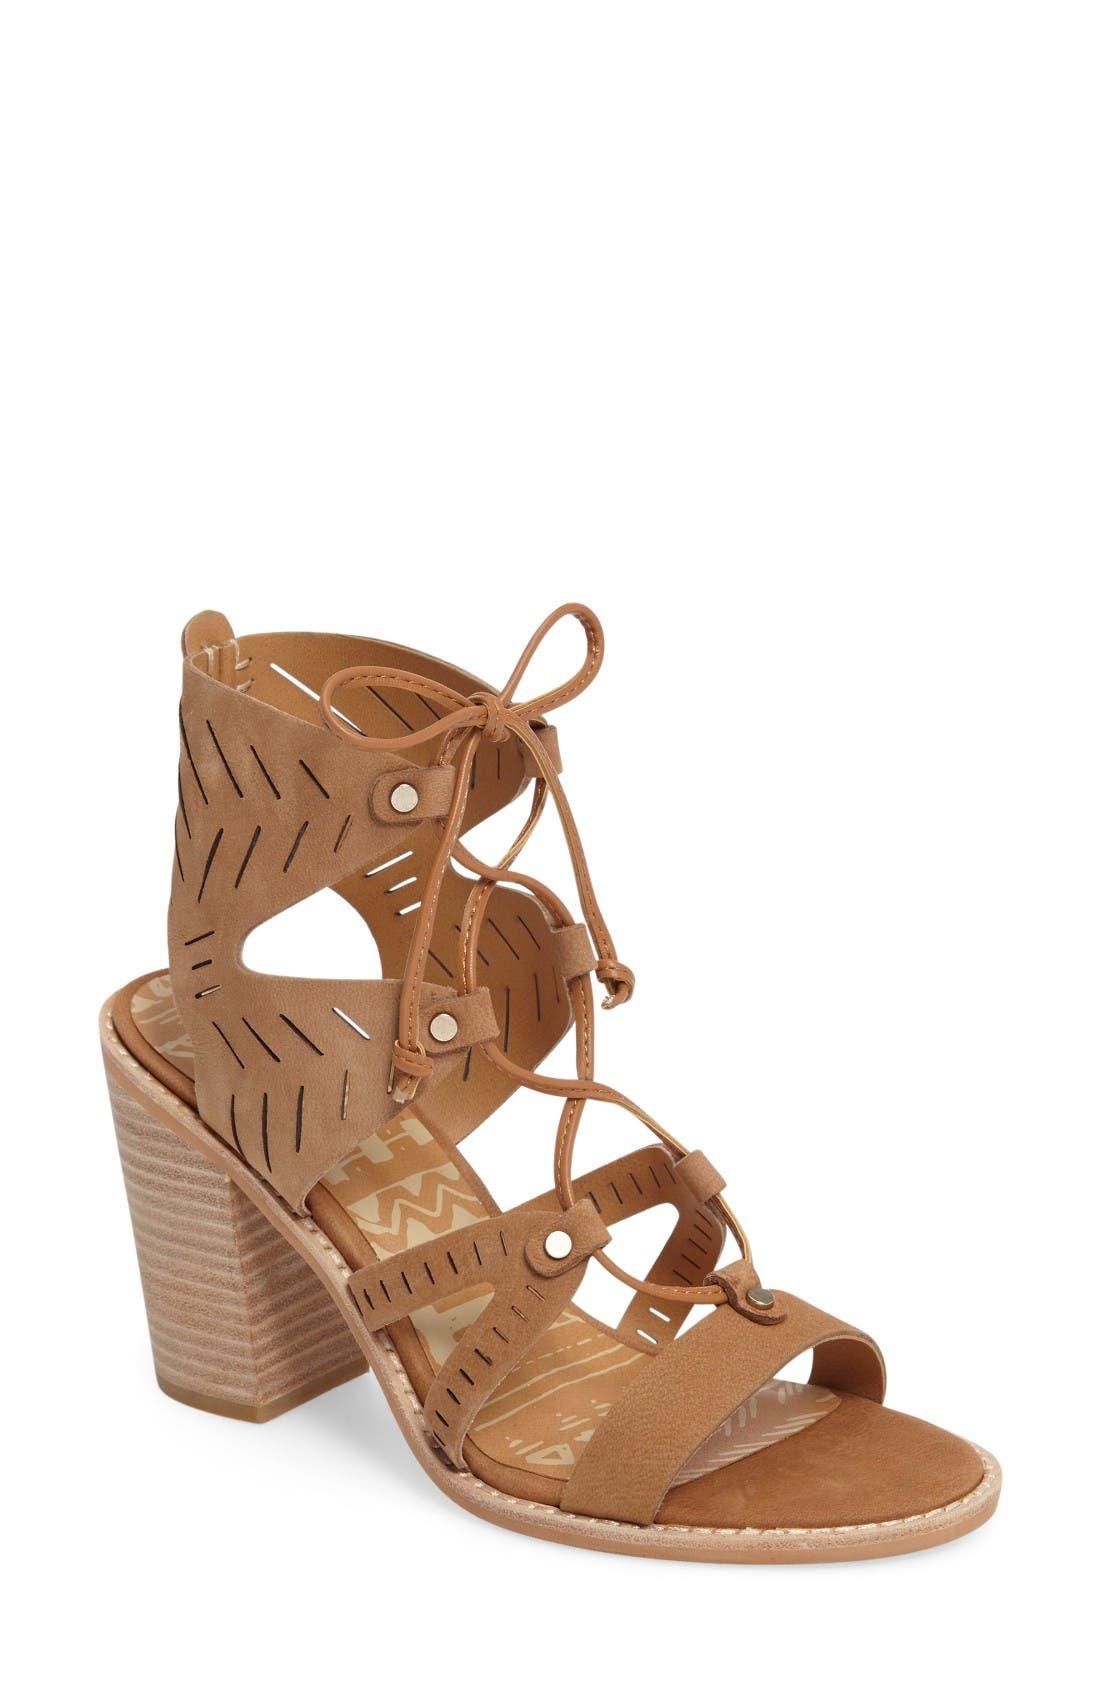 Luci Ghillie Lace Sandal,                             Main thumbnail 1, color,                             Saddle Nubuck Leather